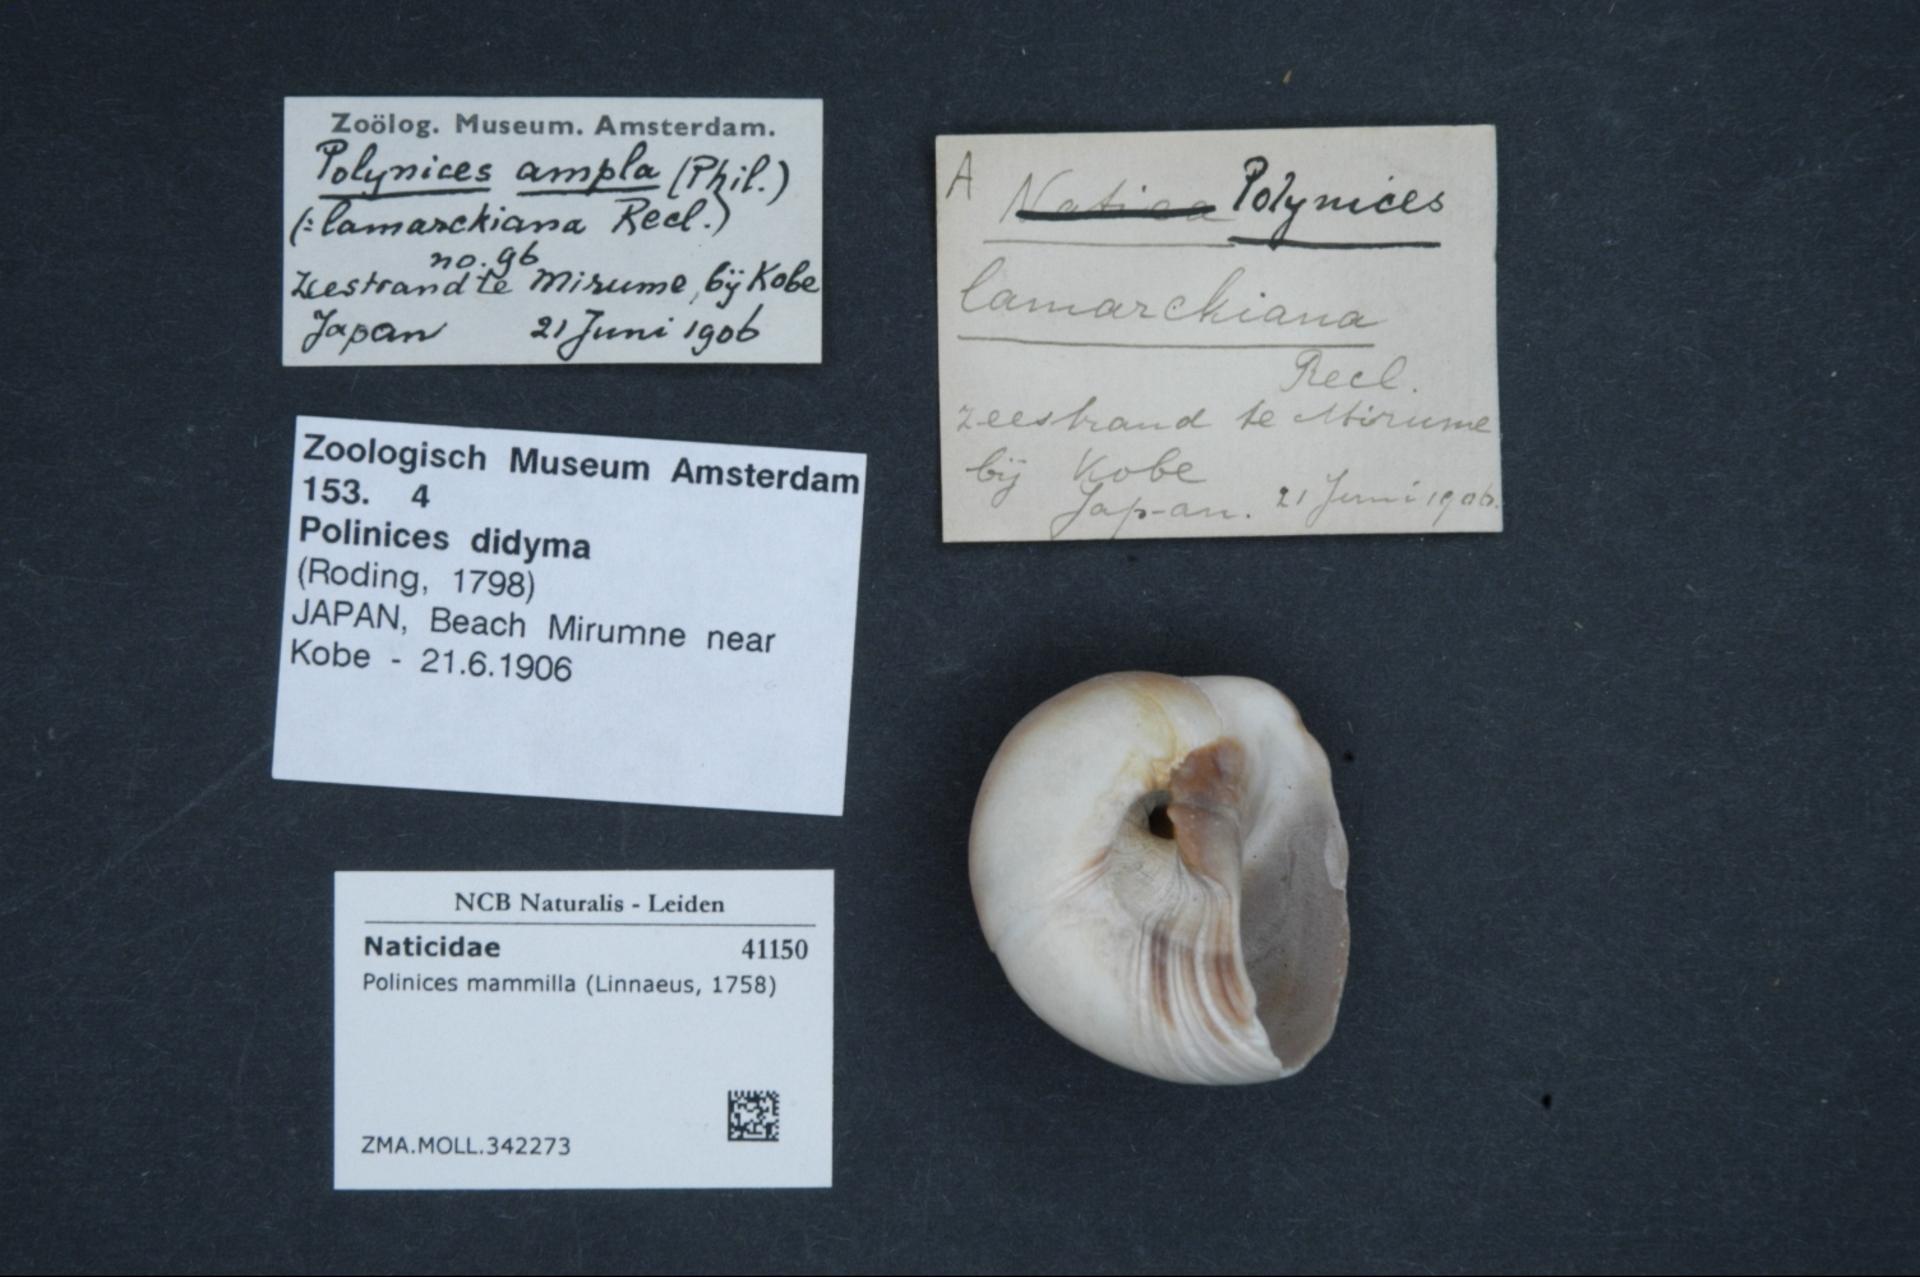 ZMA.MOLL.342273 | Polinices mammilla (Linnaeus, 1758)